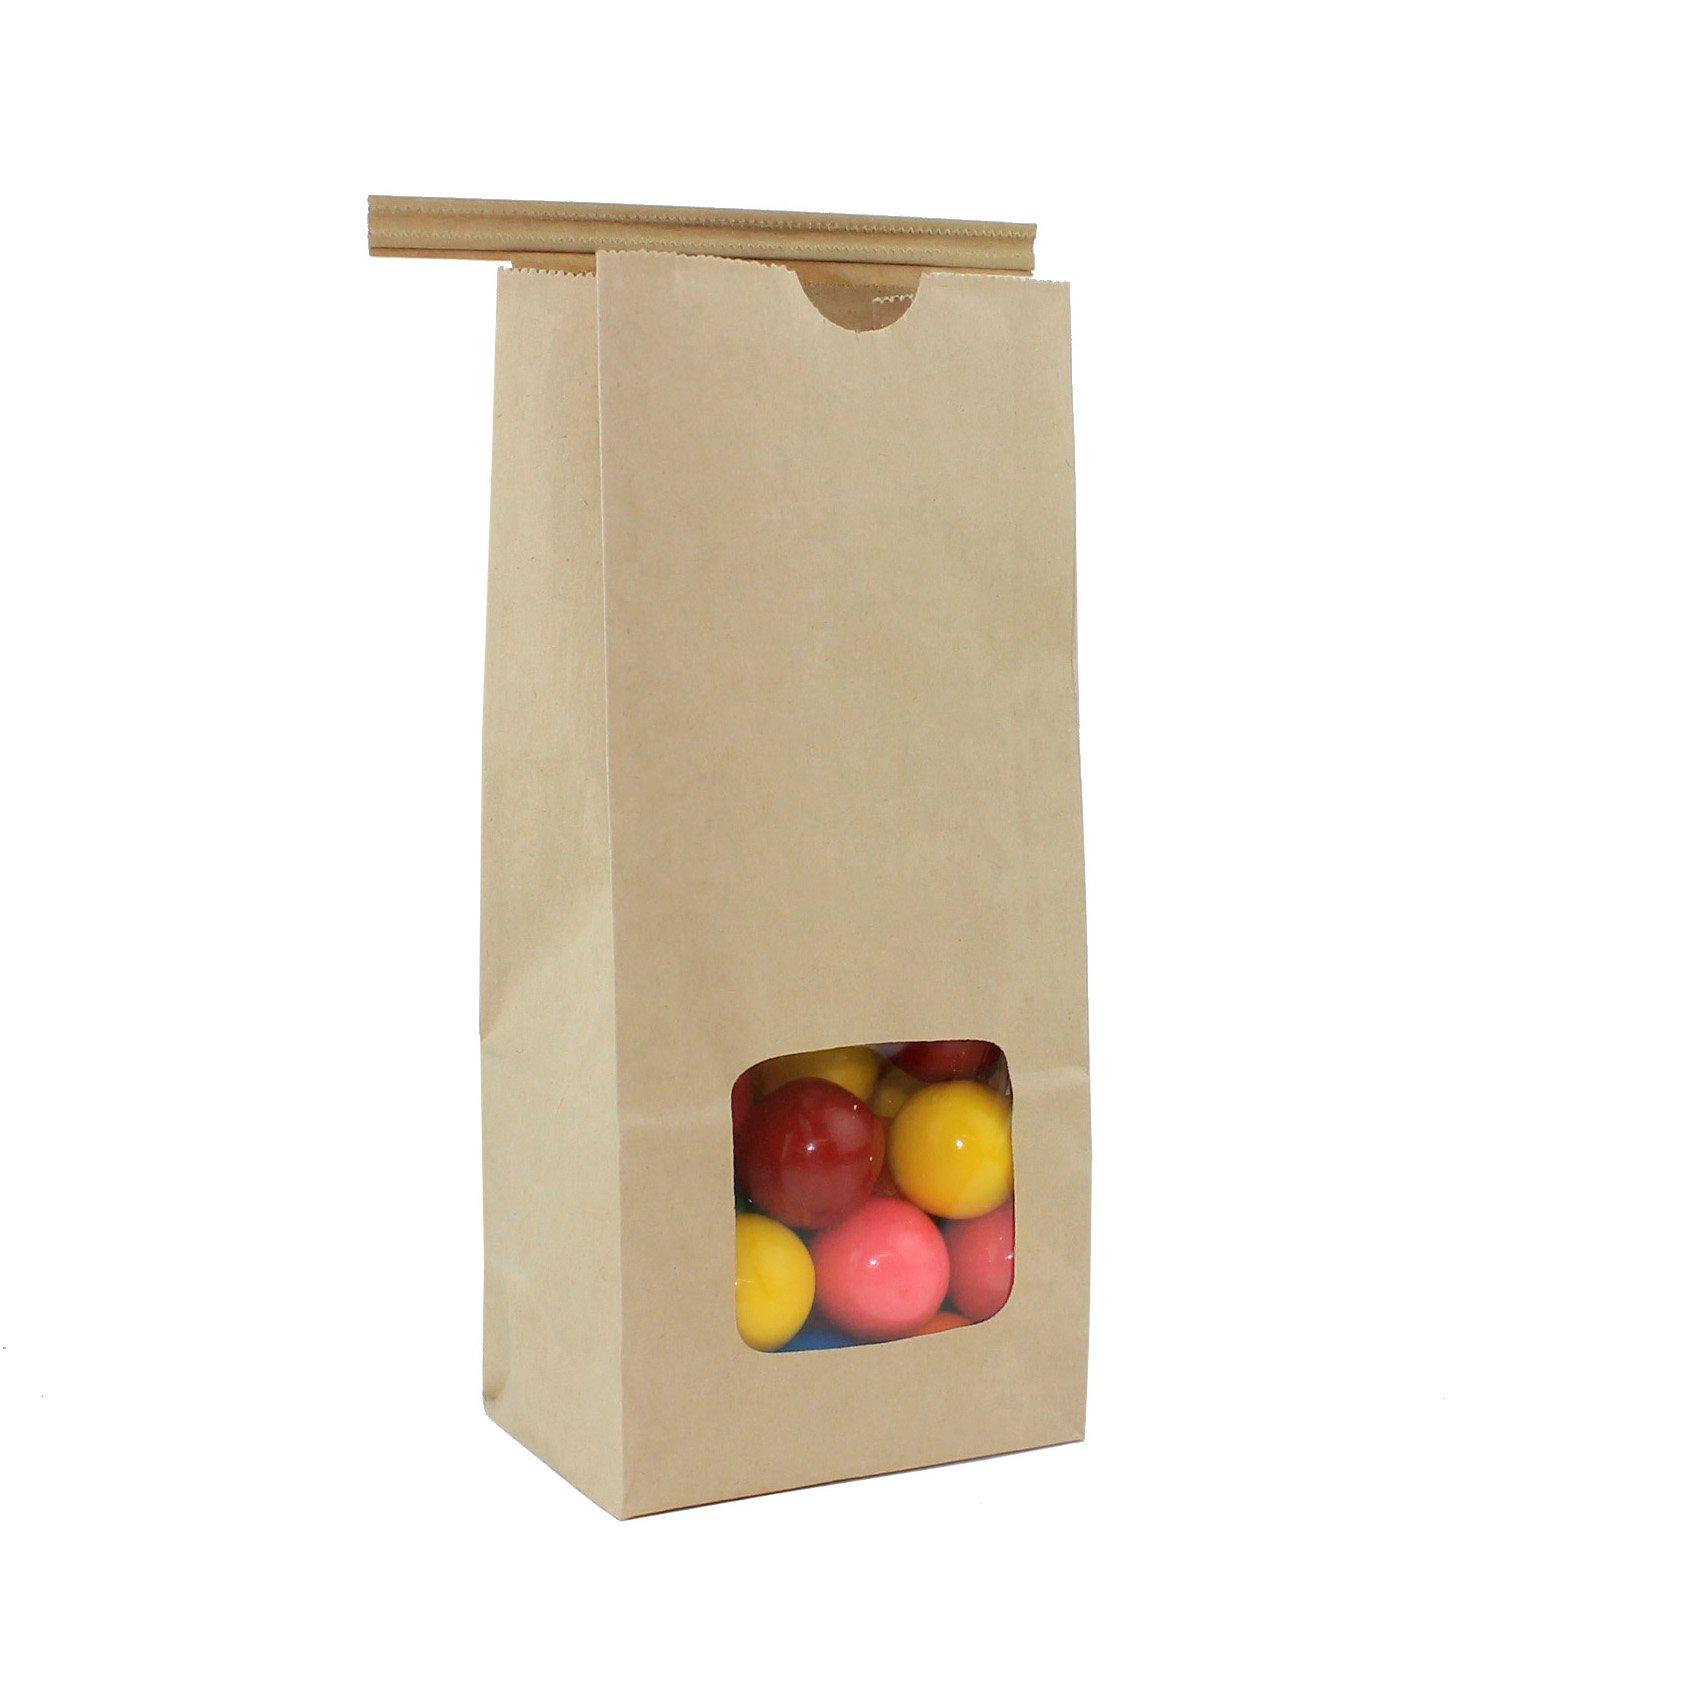 AwePackage 1/2 Lb(8 oz) Kraft Tin Tie Paper Bag with window (100 Pack)